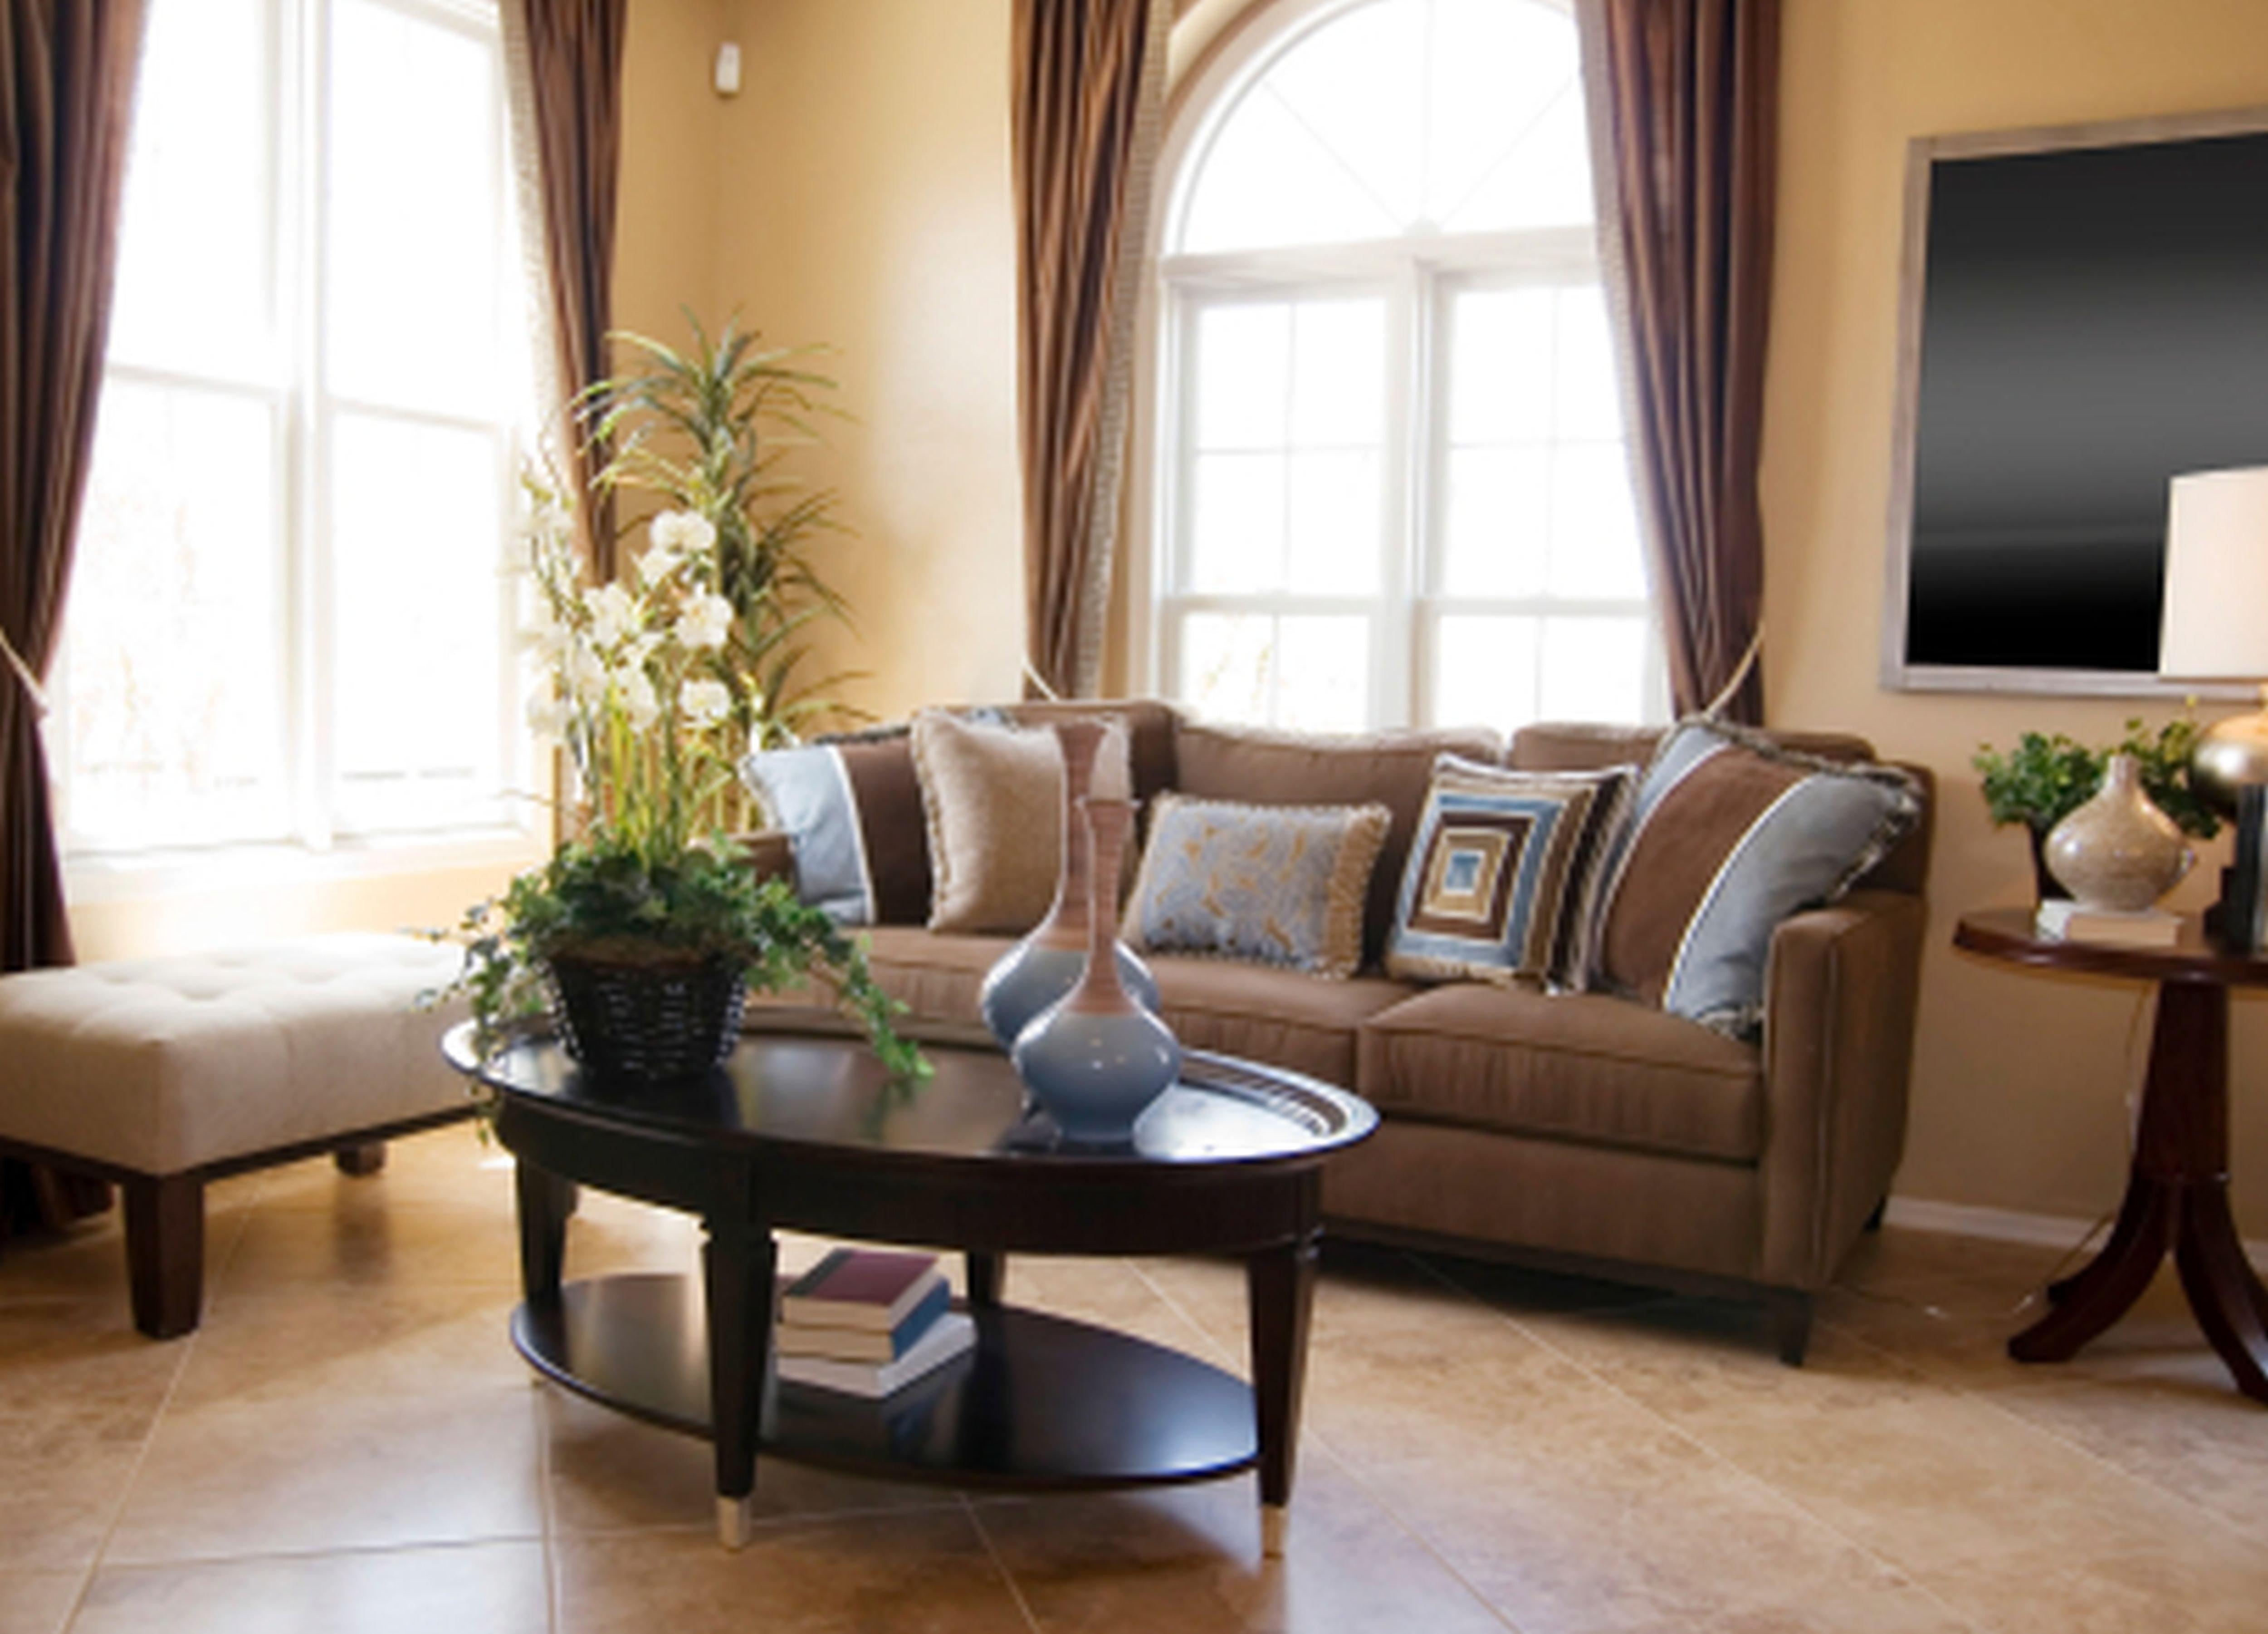 10 Stylish House Decorating Ideas On A Budget budget living room decorating ideas elegant low bud interior design 2021